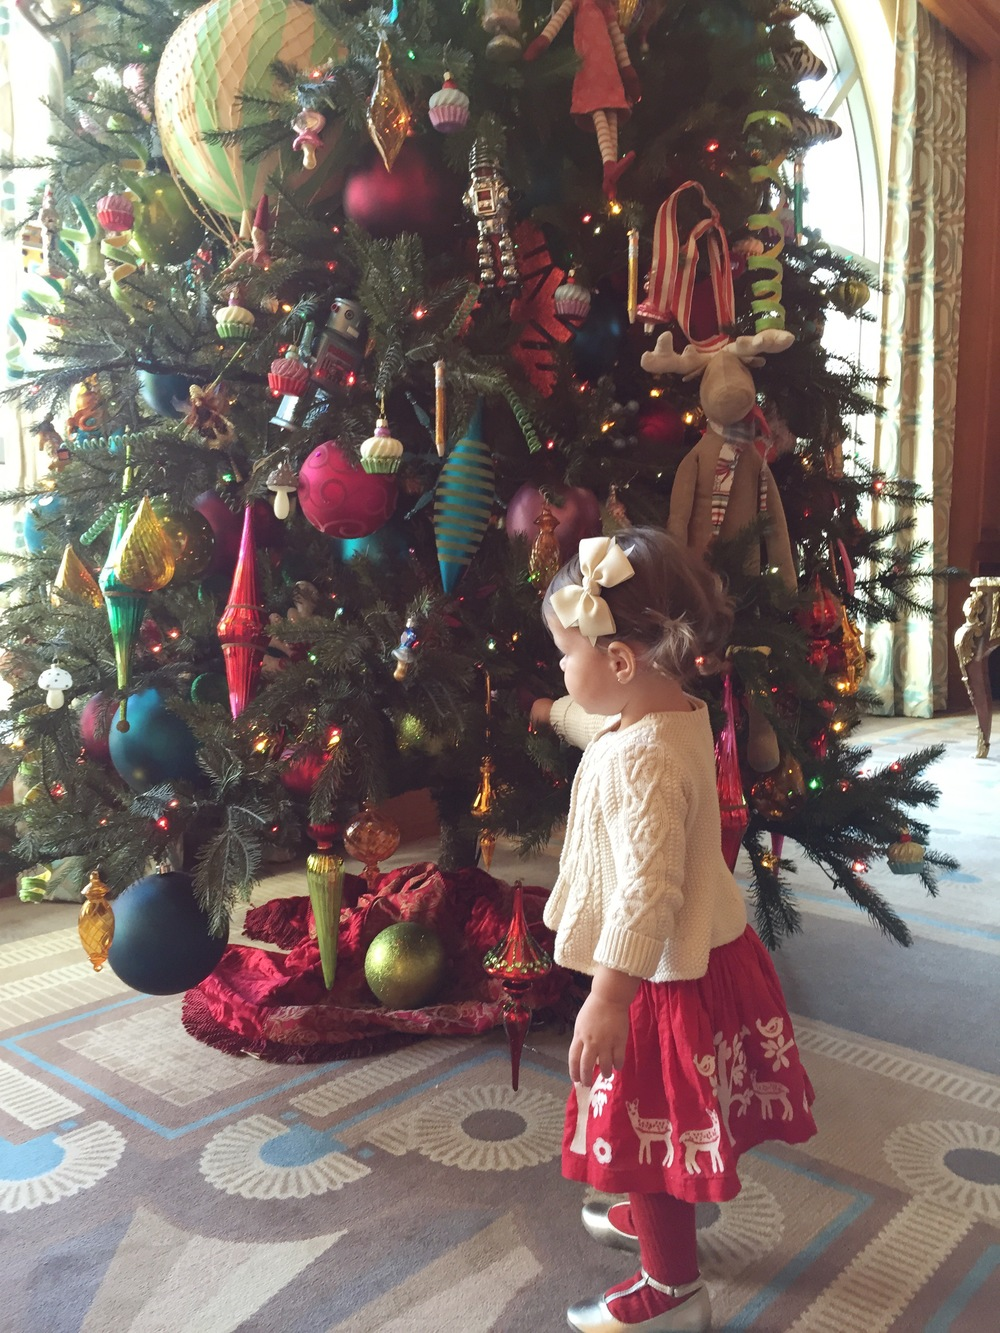 The Grand America Christmas